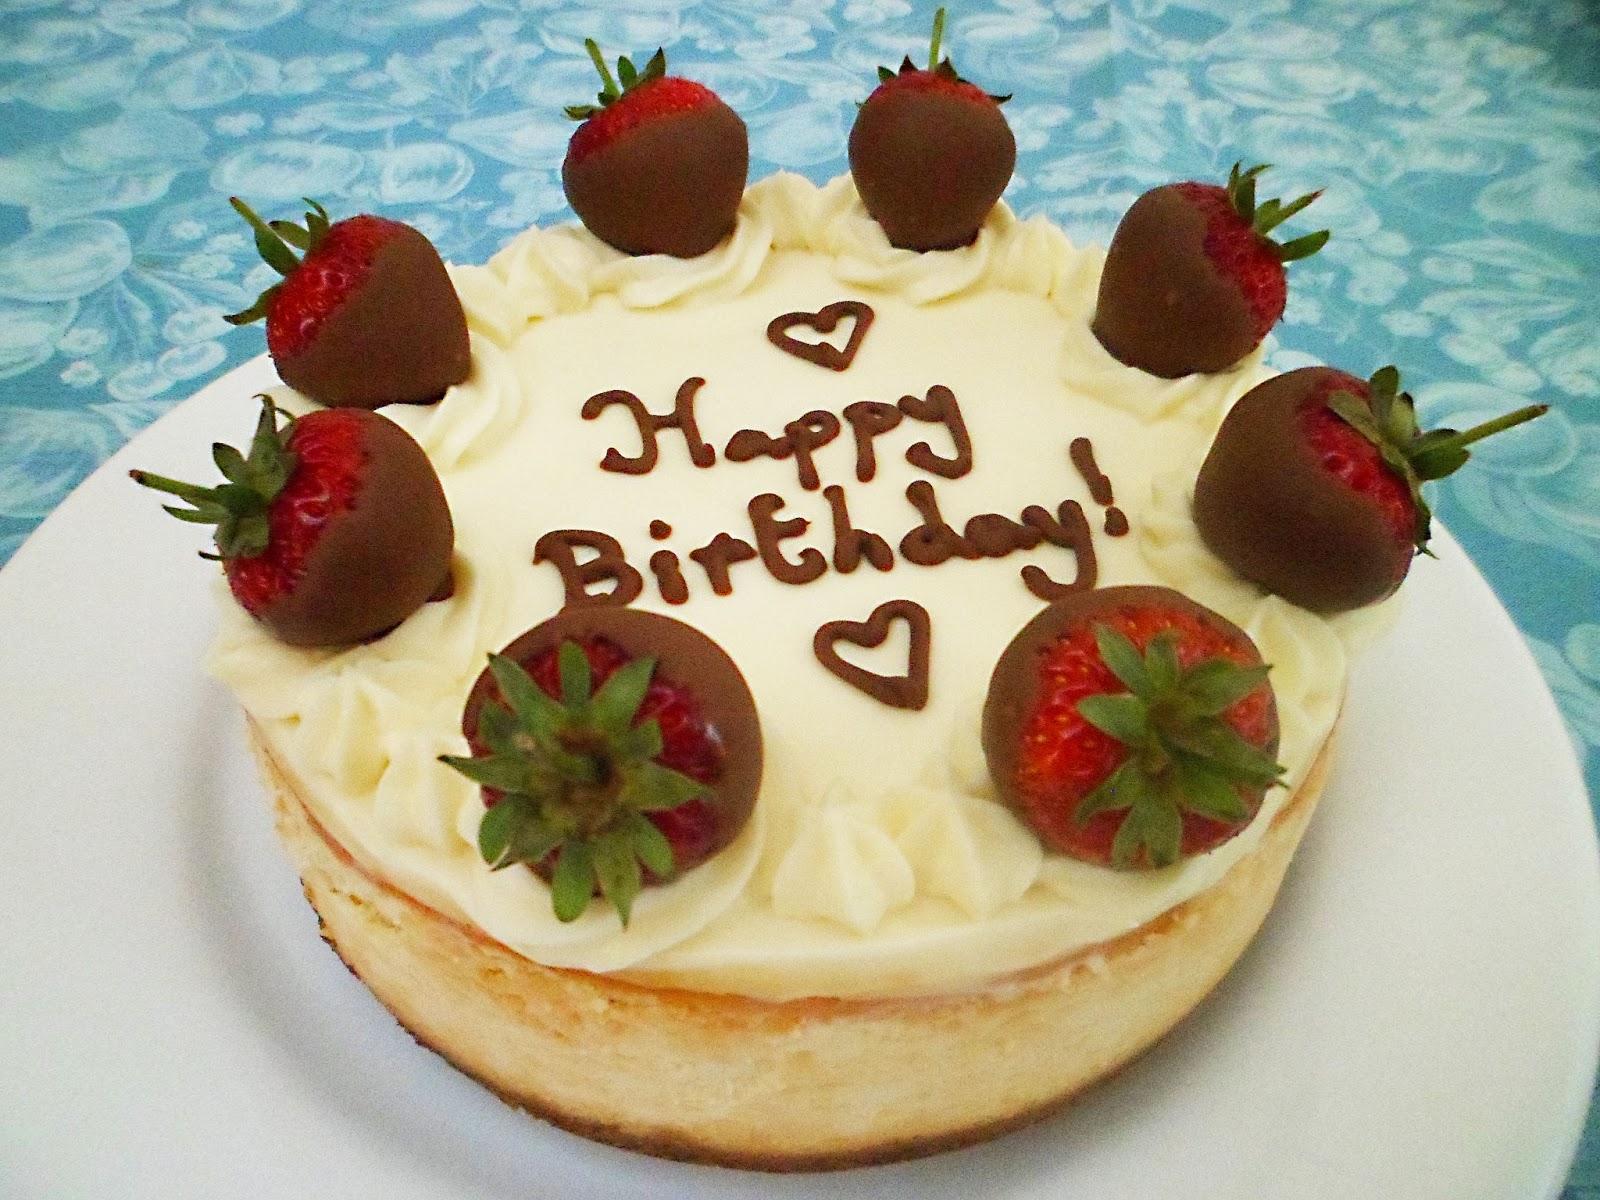 Recipe For Birthday Cake Cheesecake Image Inspiration of Cake